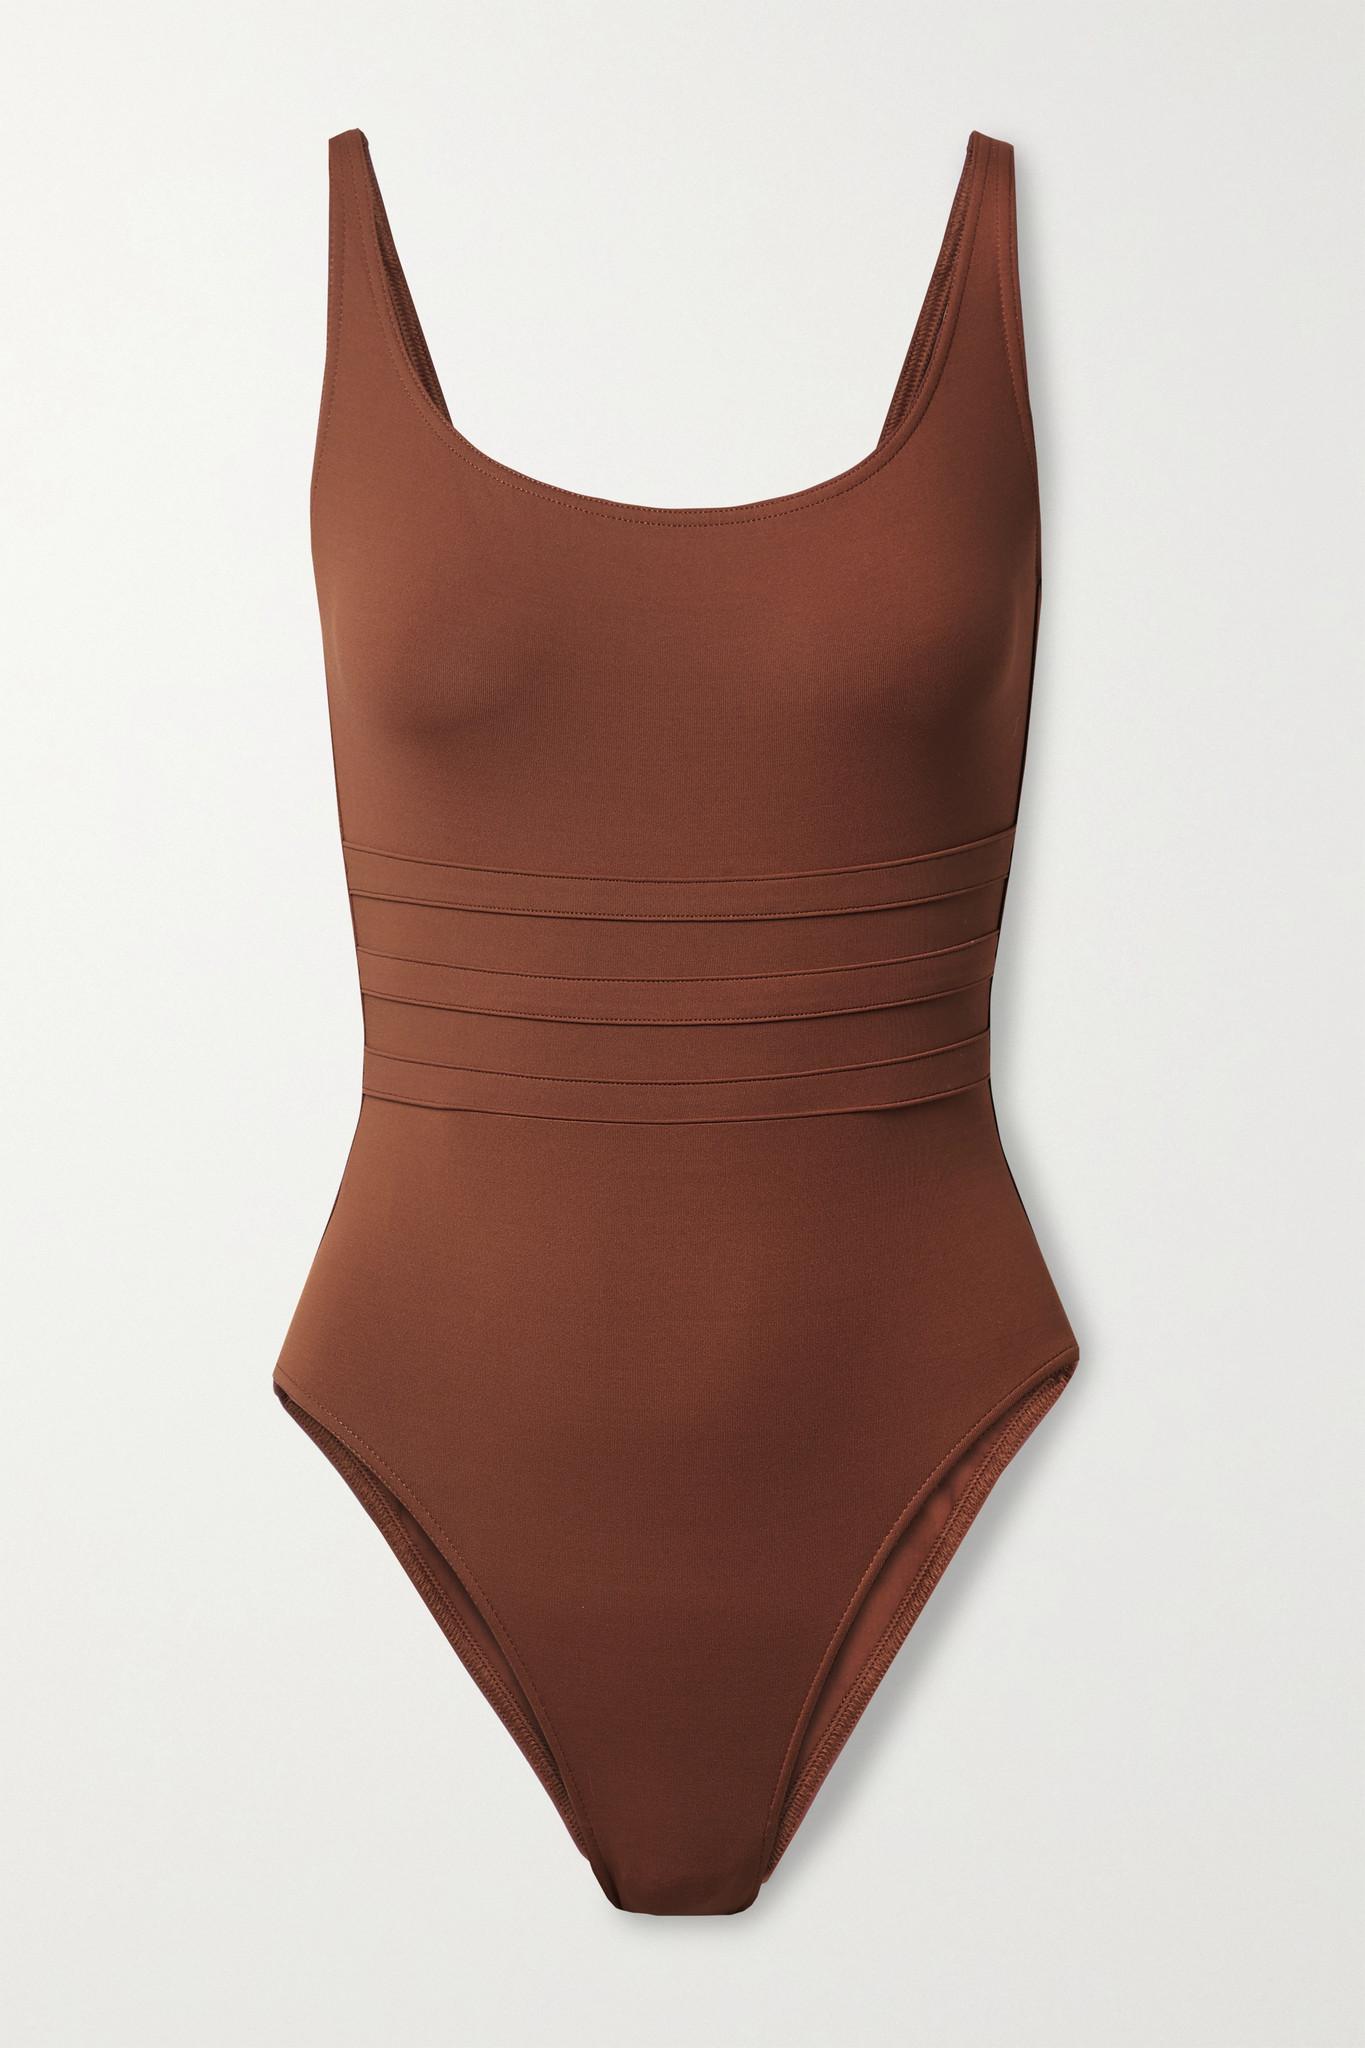 ERES - Les Essentials Asia Swimsuit - Brown - FR44